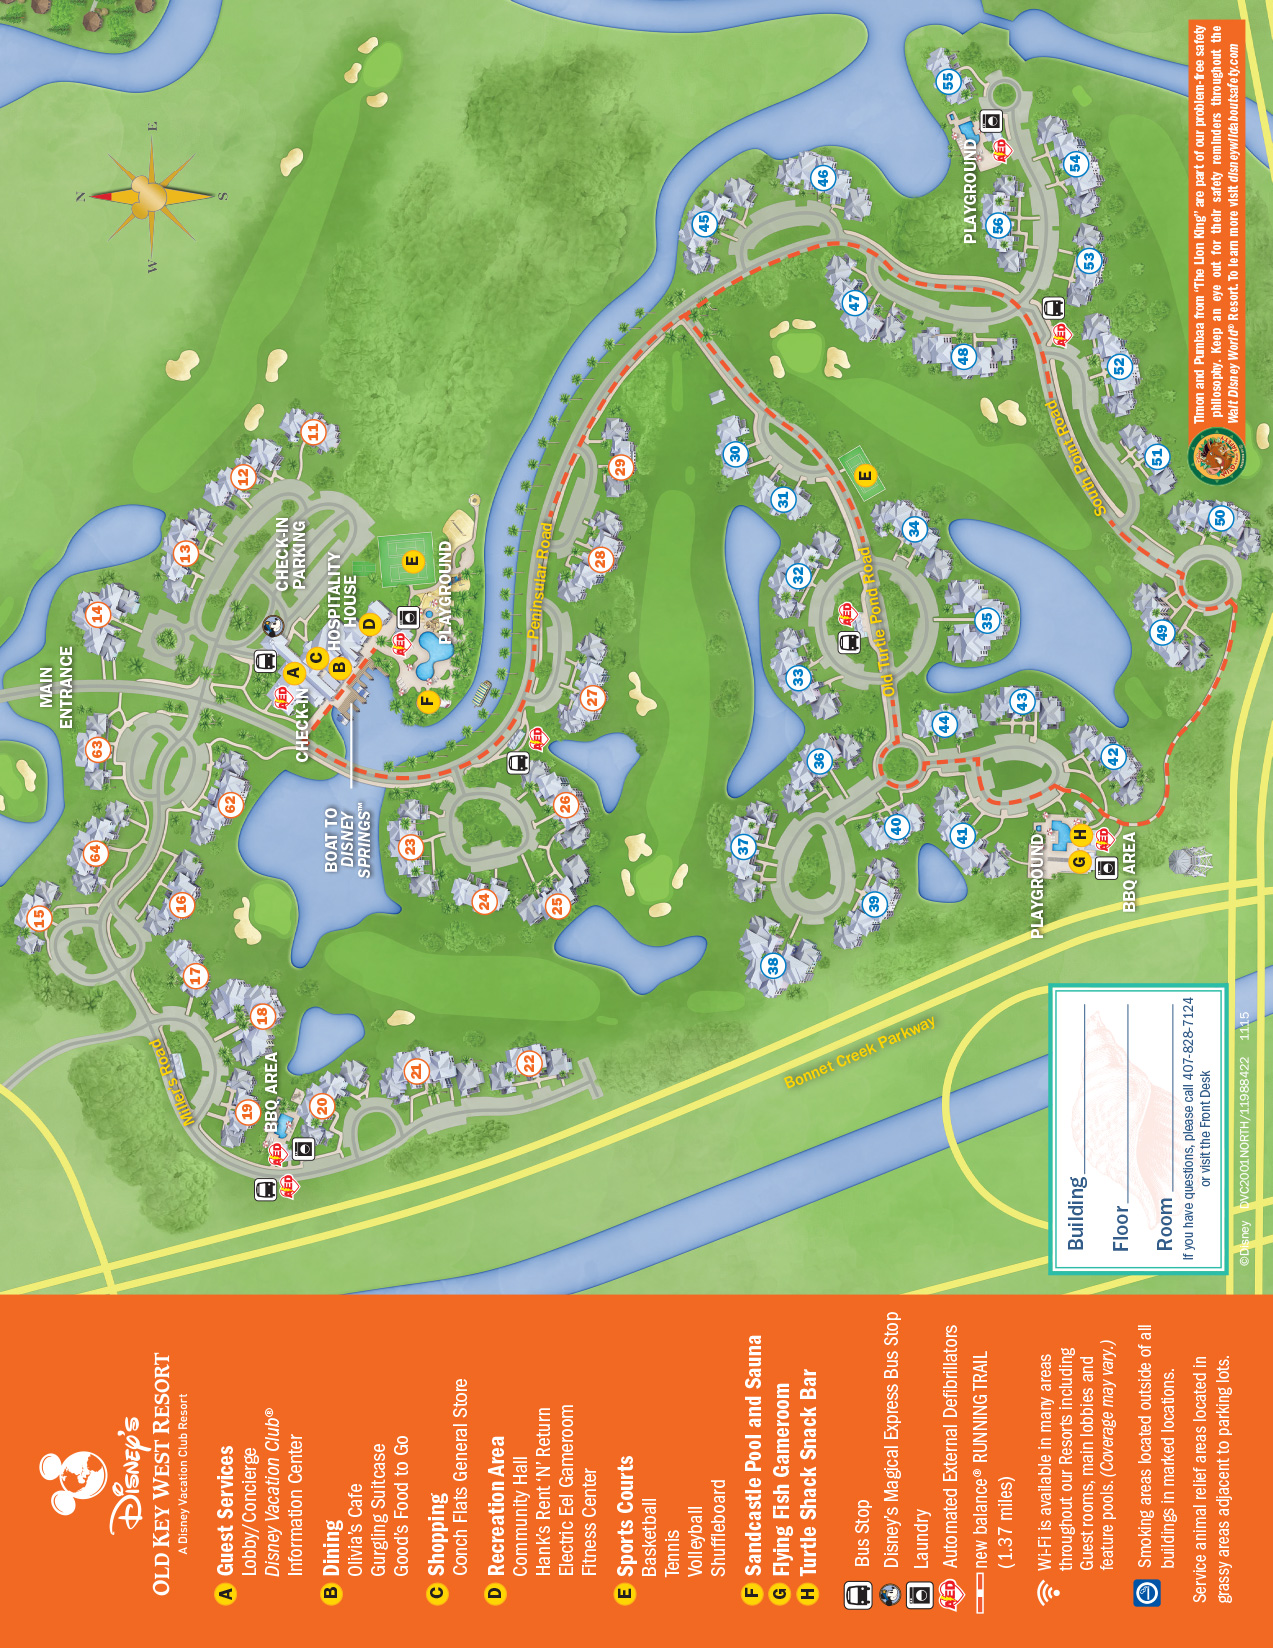 Old Key West Resort Recreation Activities Guide